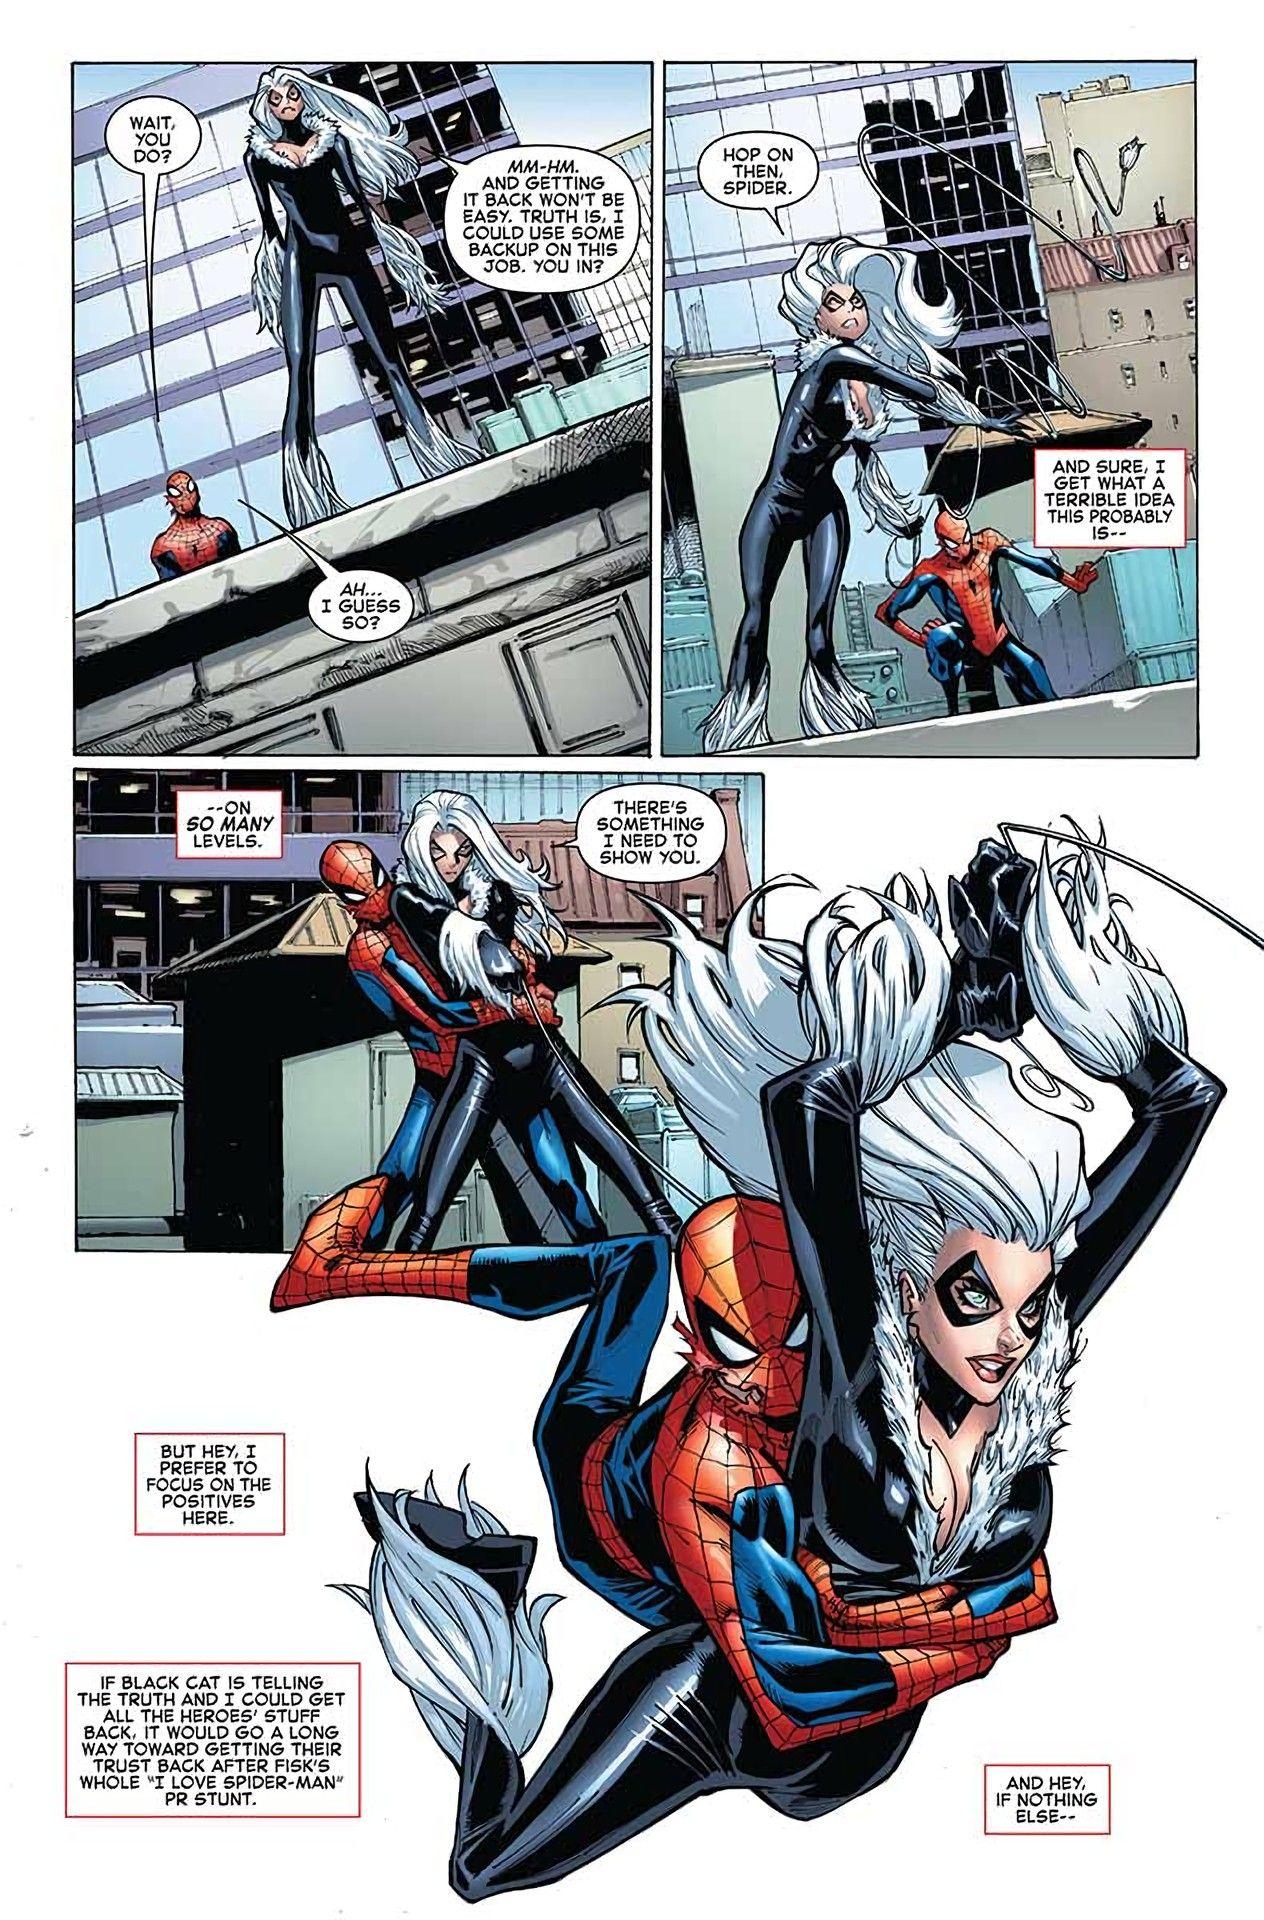 95581679 (w), Humberto Ramos (a), Michele Bandini (a), Victor Olazaba (i), and Edgar  Delgado (c).] The Amazing Spider-Man (2018) #9 (Nov. 2018), [Marvel Comics]:  07.